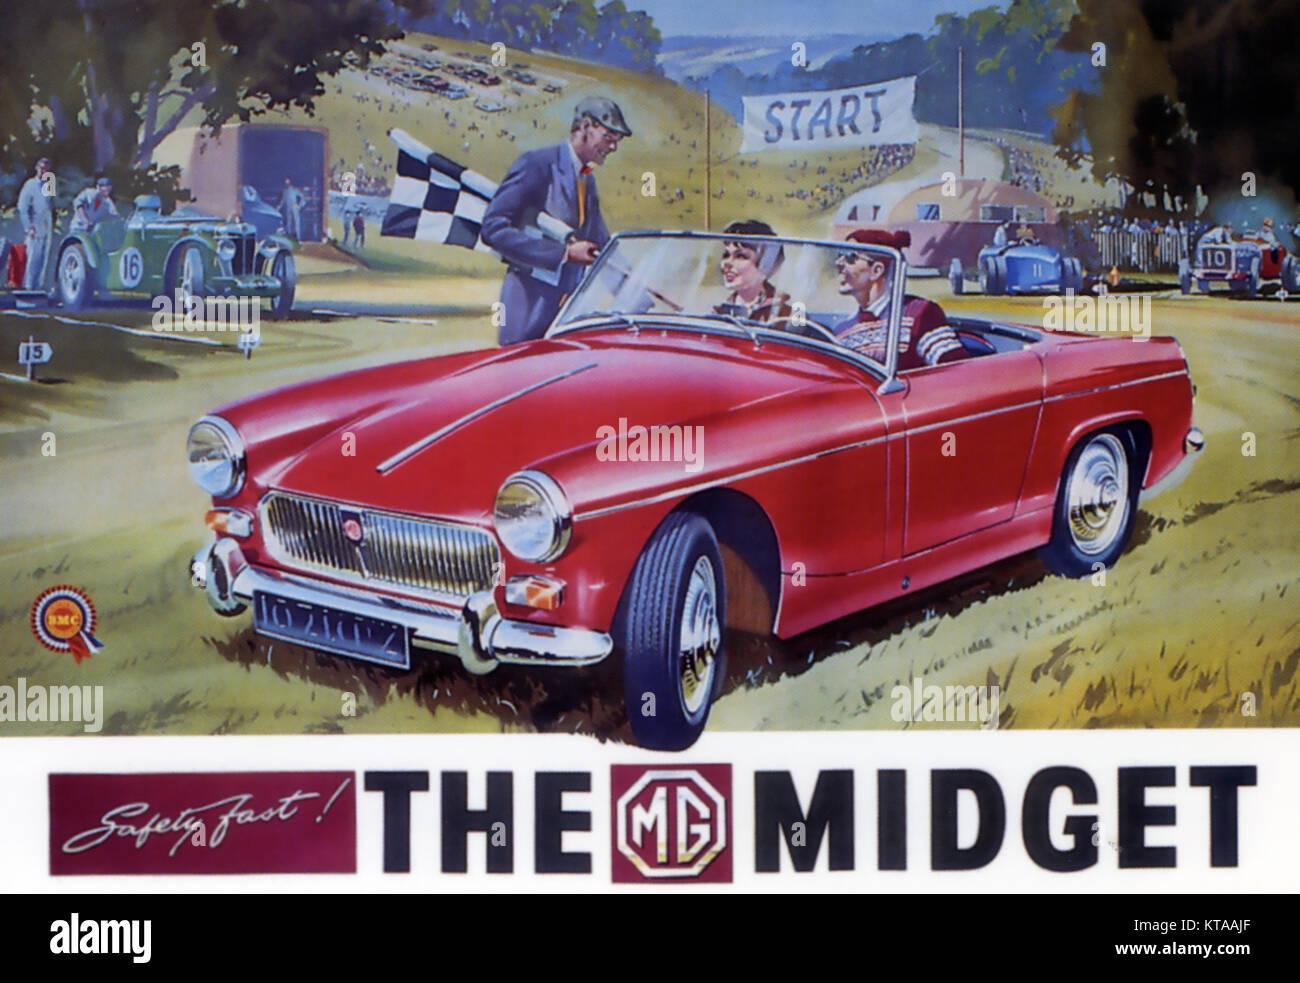 MG MIDGET 1.1 litre sports car in a advert av=bout 1963 - Stock Image